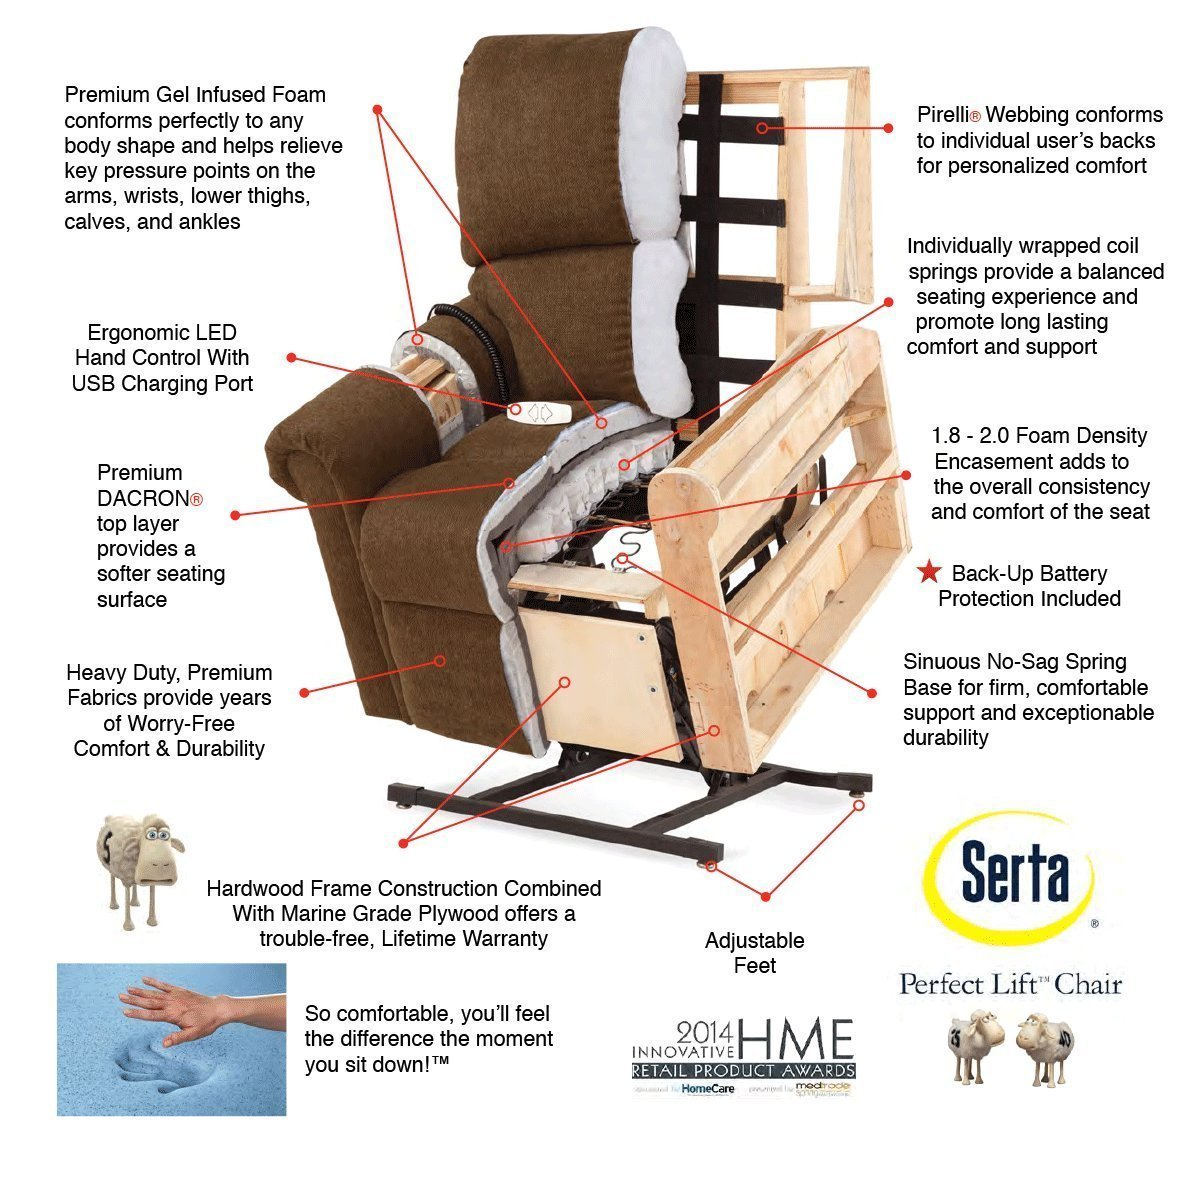 Serta Perfect Lift Chair